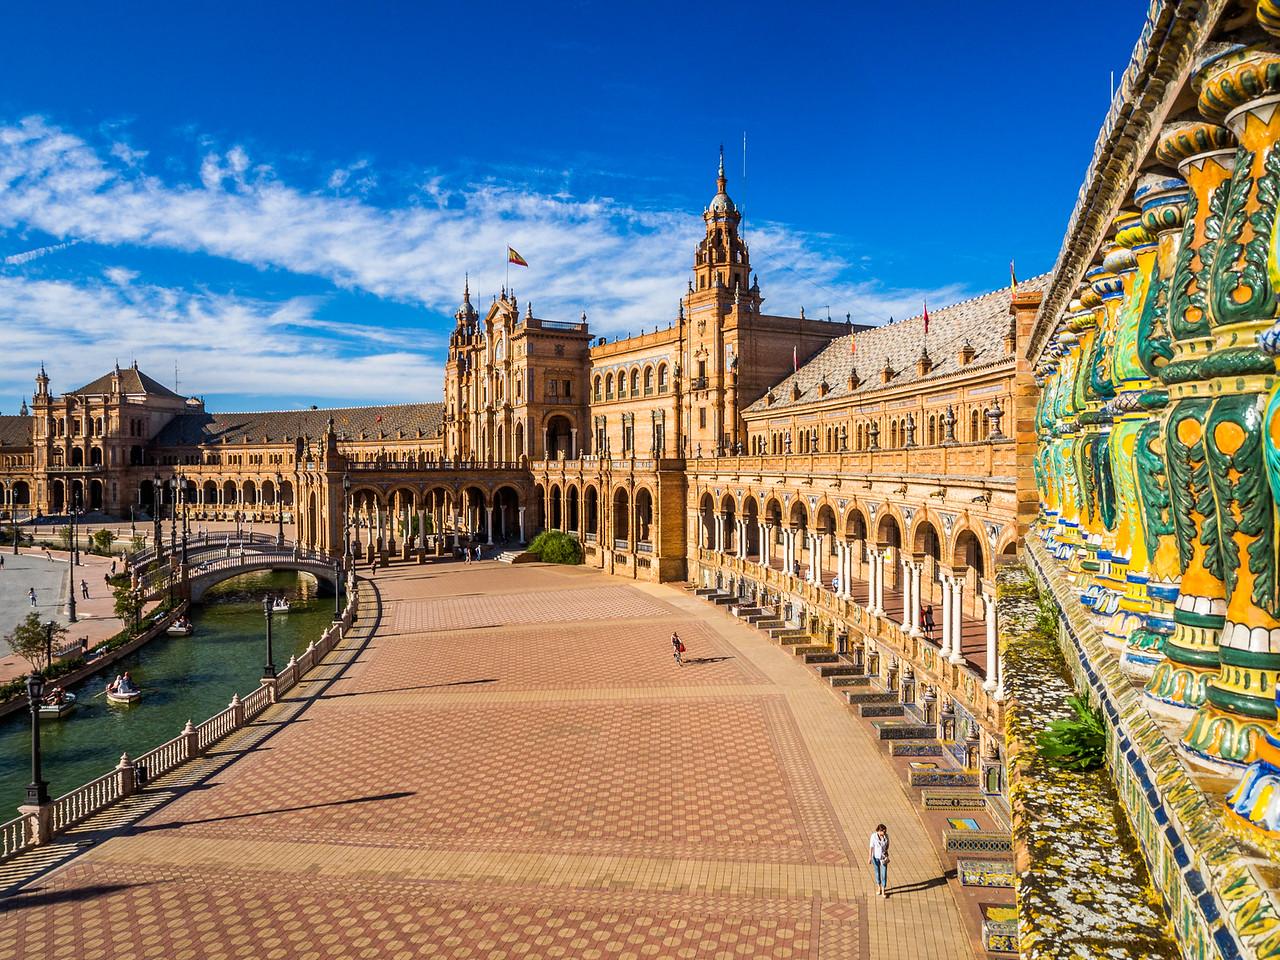 From the High Balcony of the Plaza de España, Seville, Spain